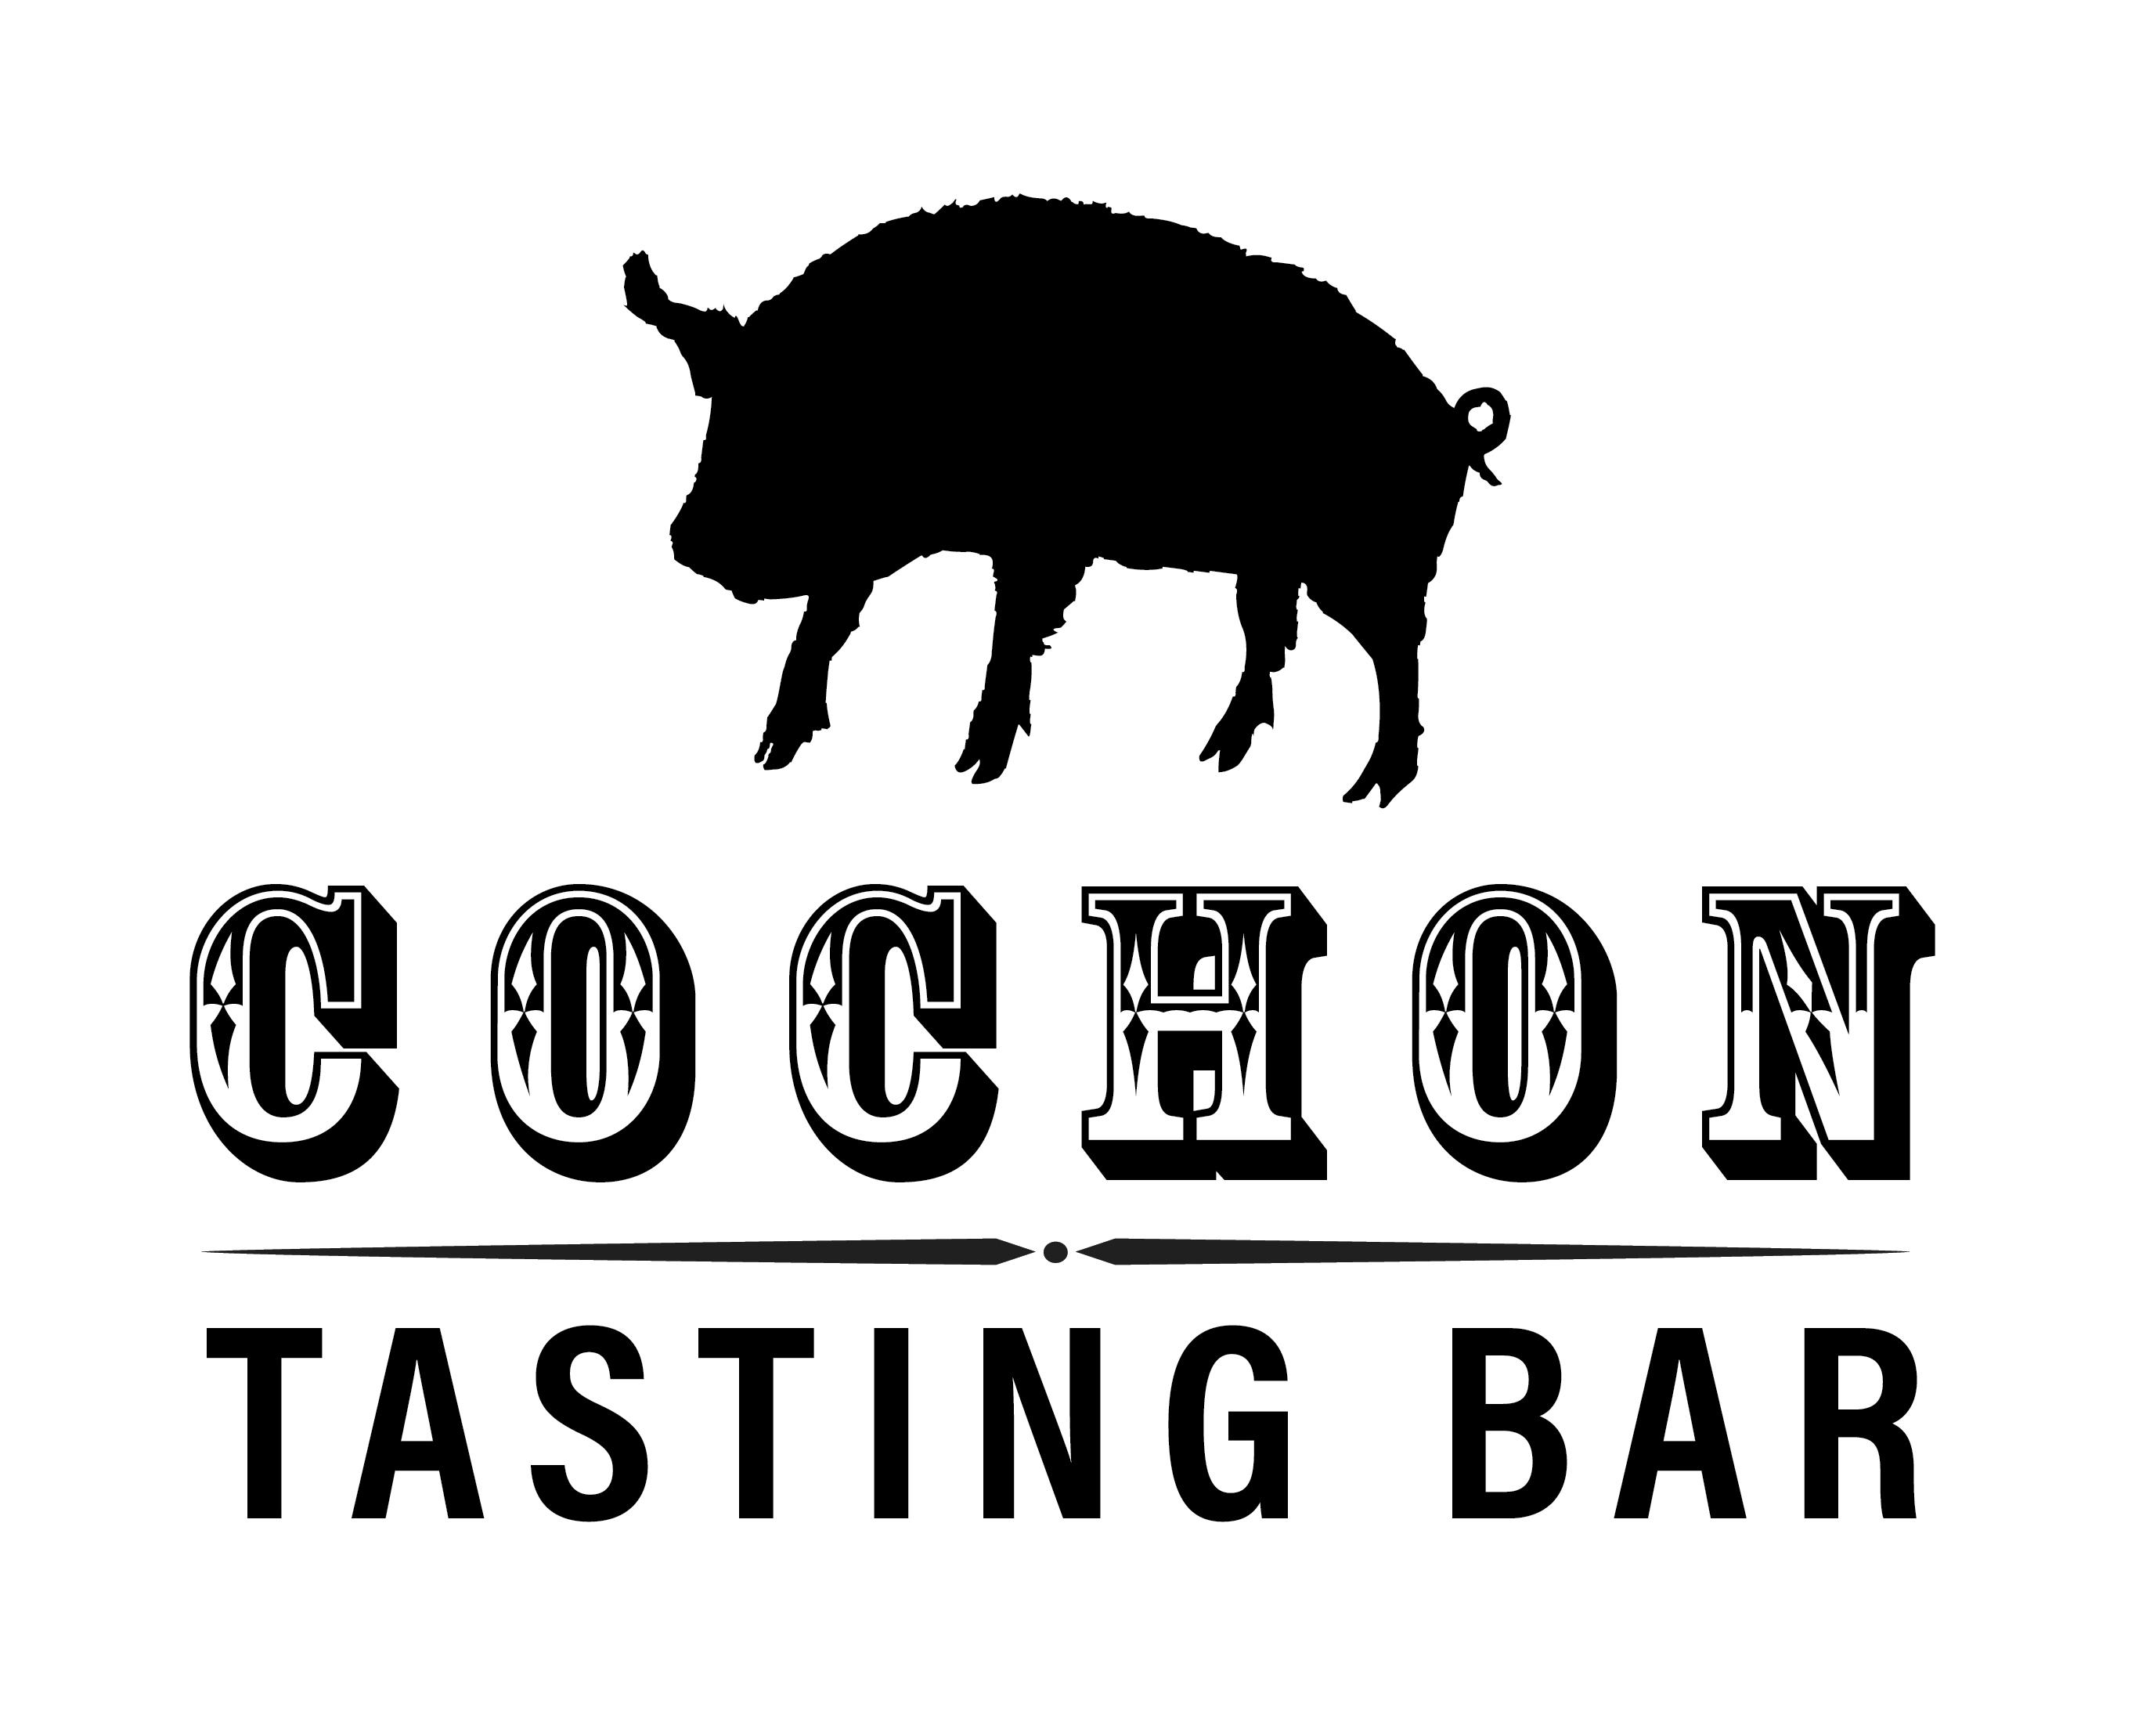 Cochon Tasting Bar